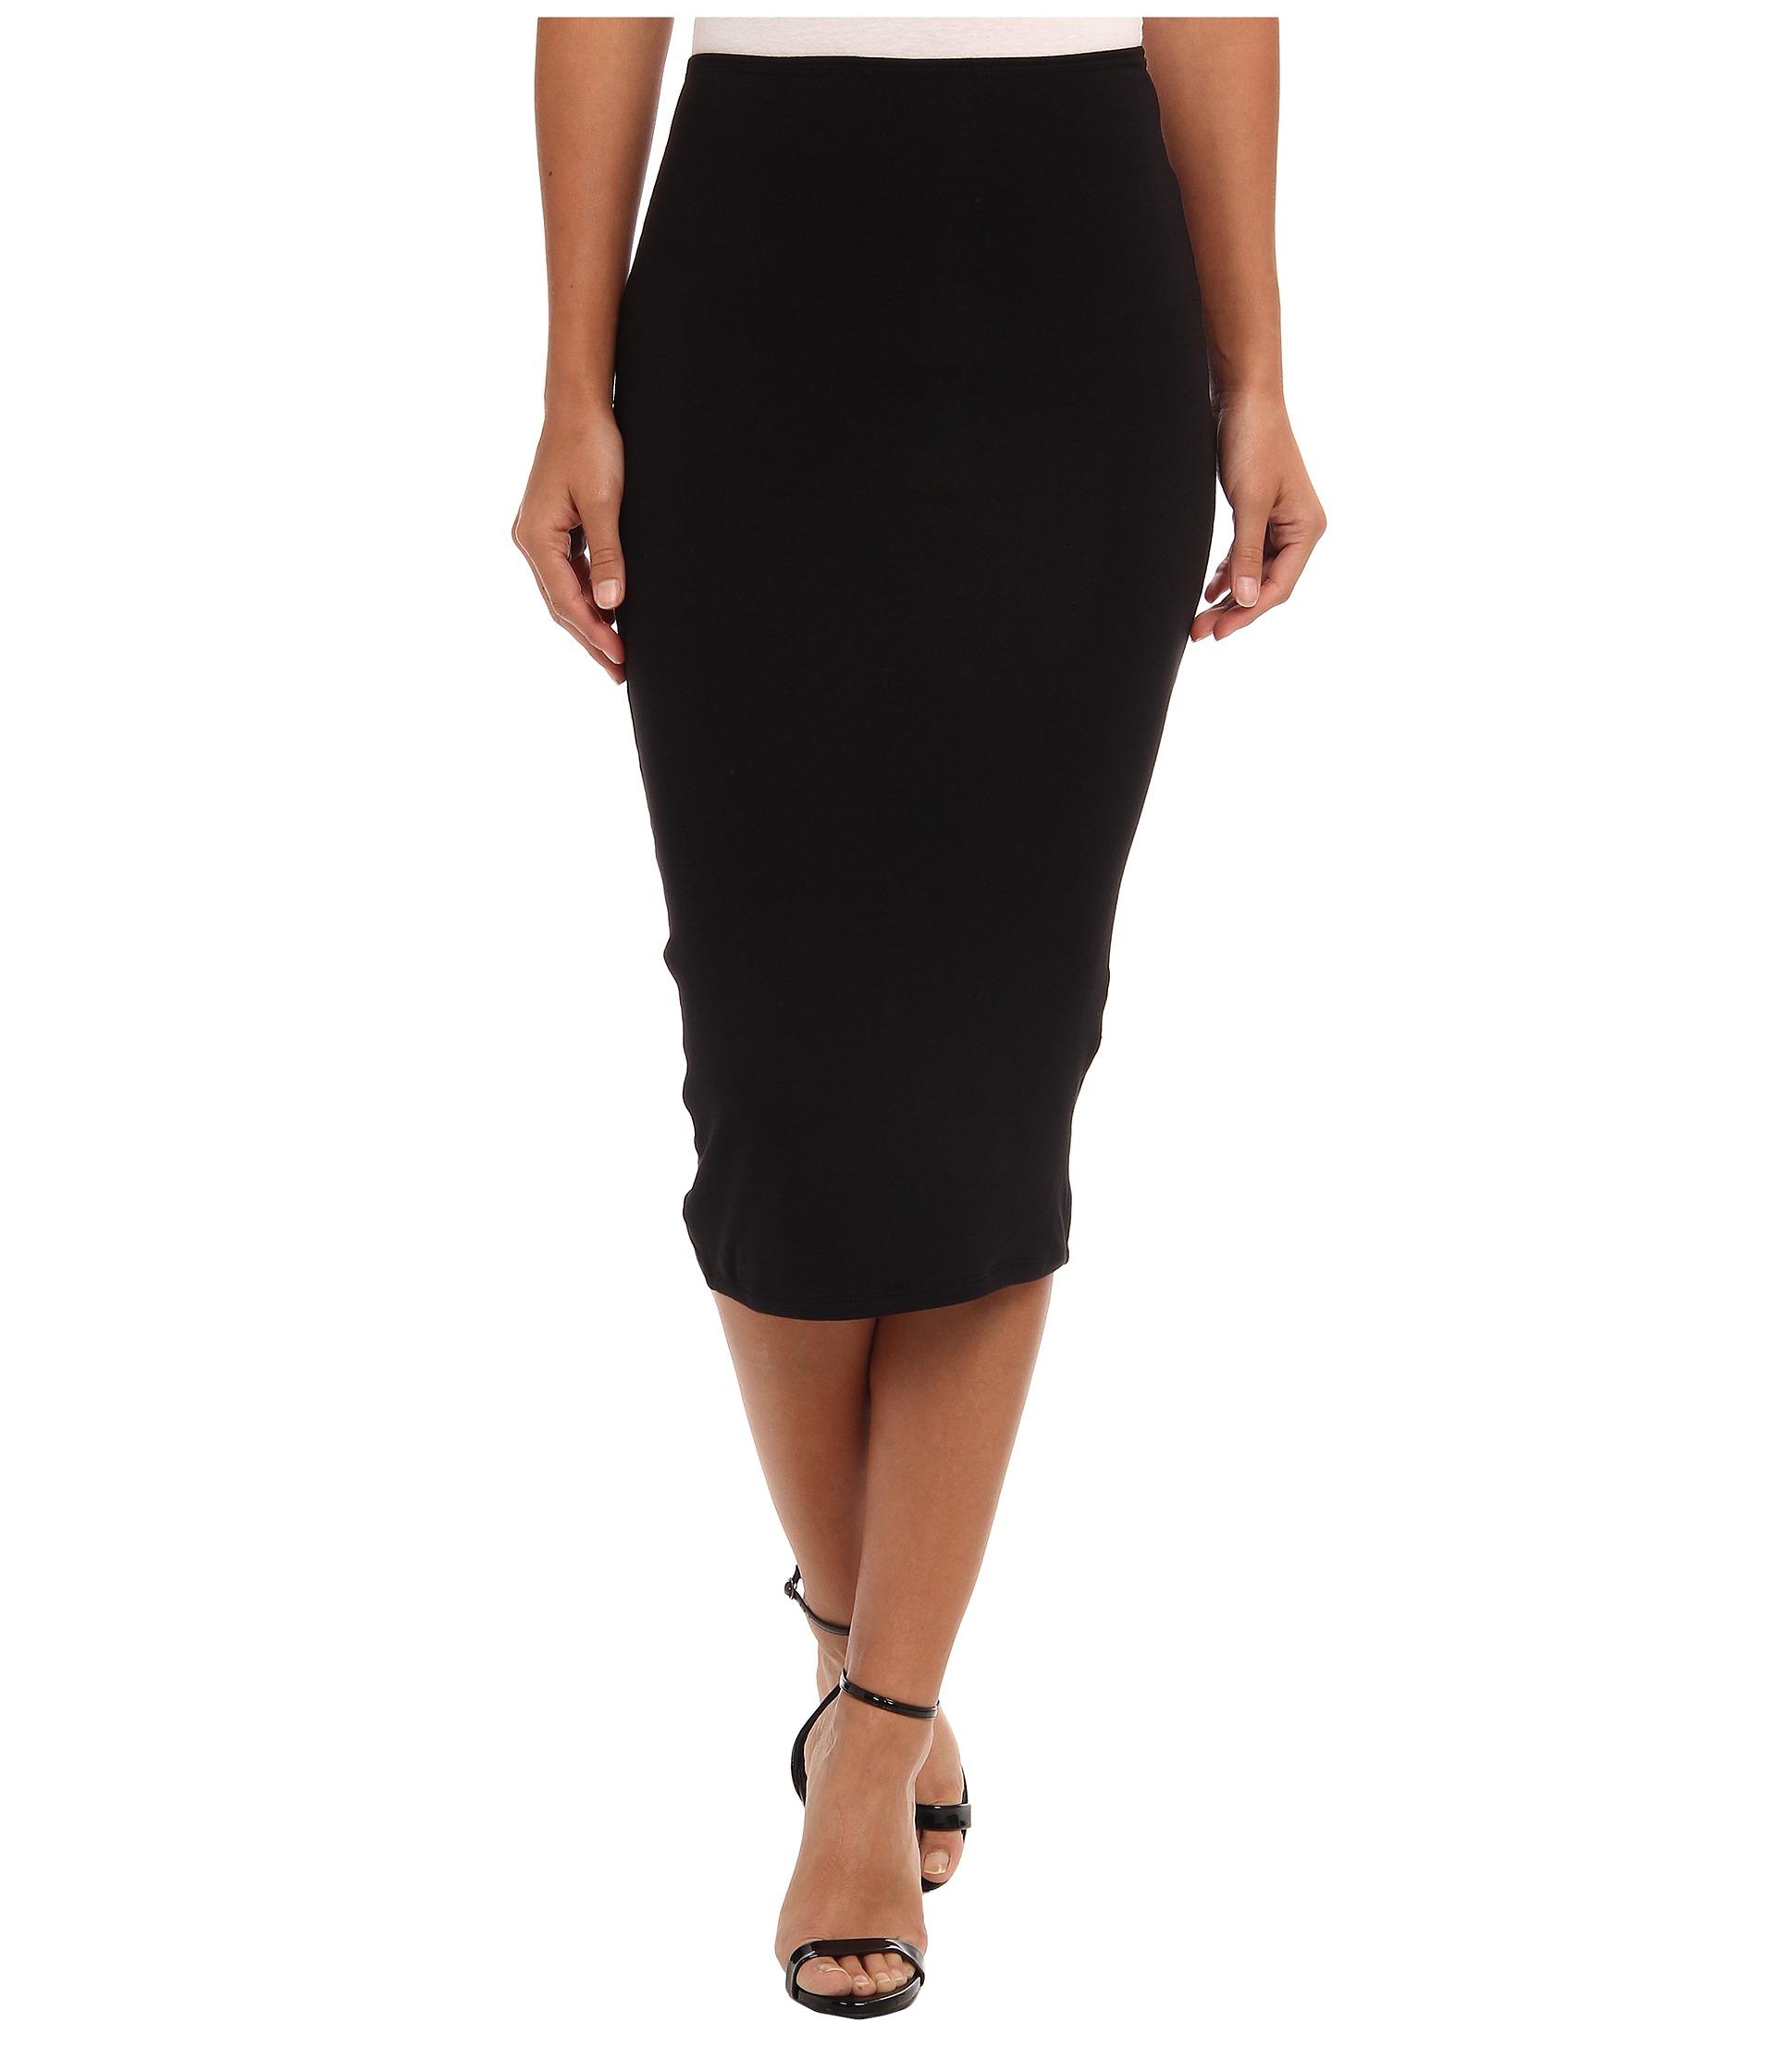 Dknyc Pull On Pencil Skirt W F Black, Black | Shipped Free at Zappos